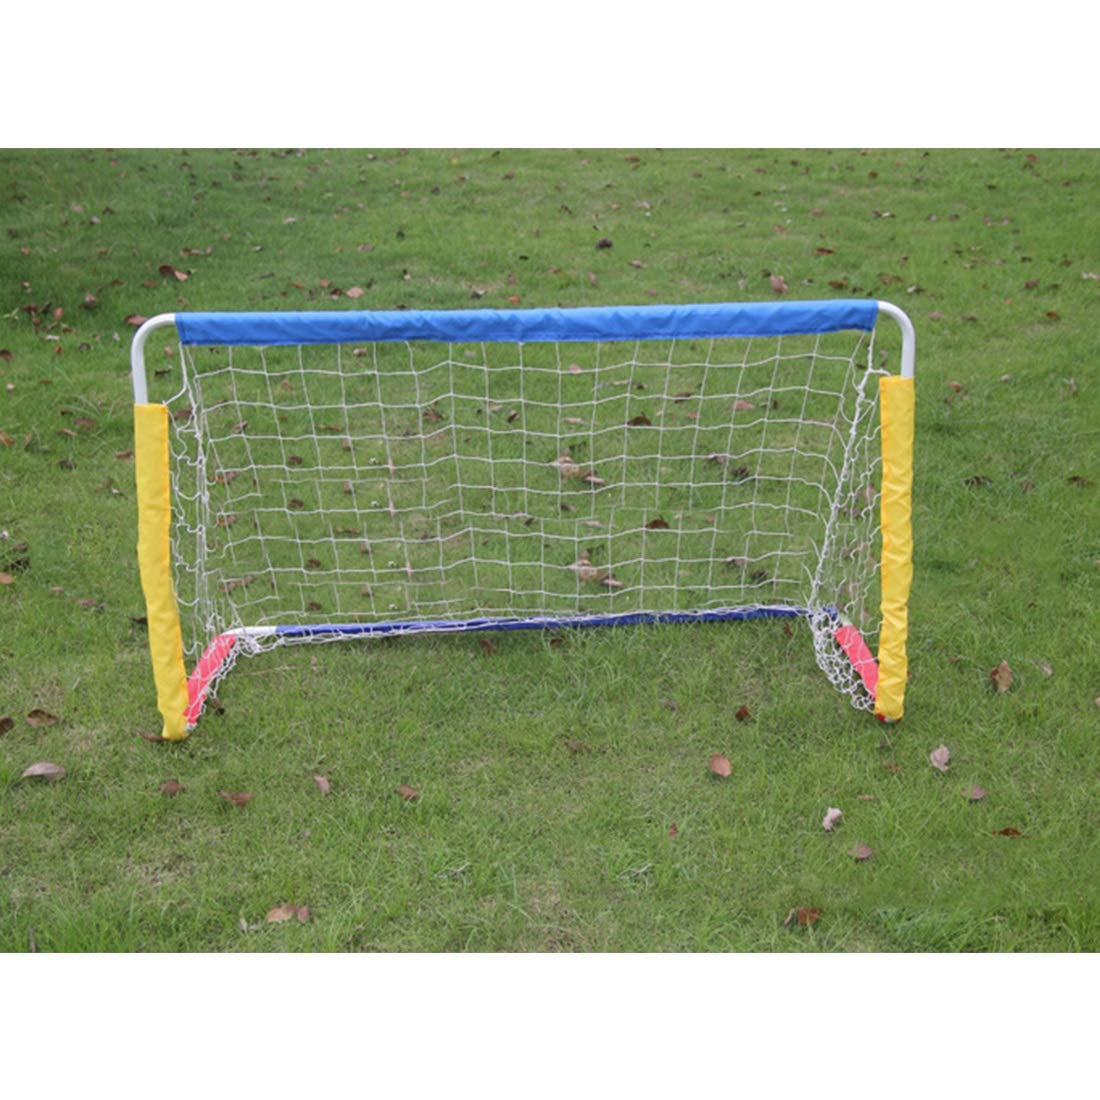 Jsqianchen Mini Goals Fußballtor Falten Kinder Erwachsene Familie Zimmer Indoor Outdoor Kombinierte Einfache Ziel